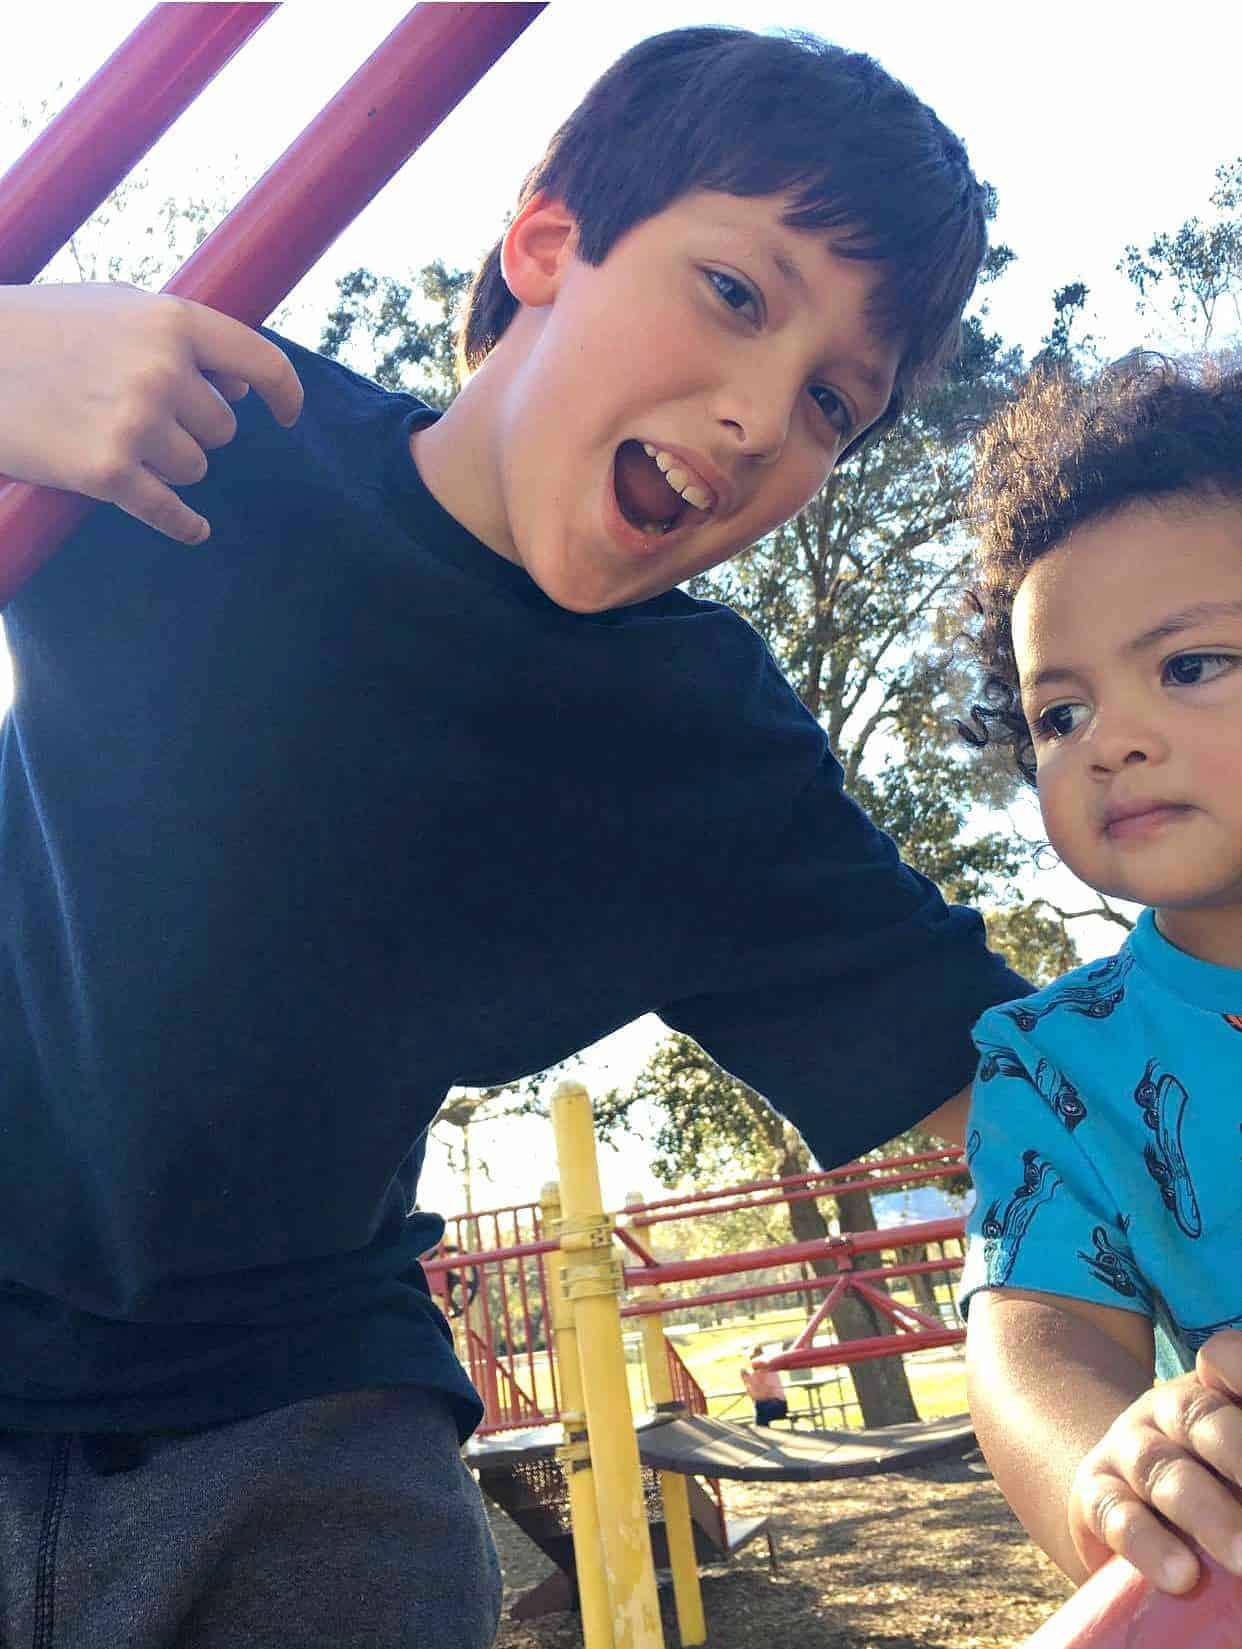 Easy & Fun Ways To Get Kids Active